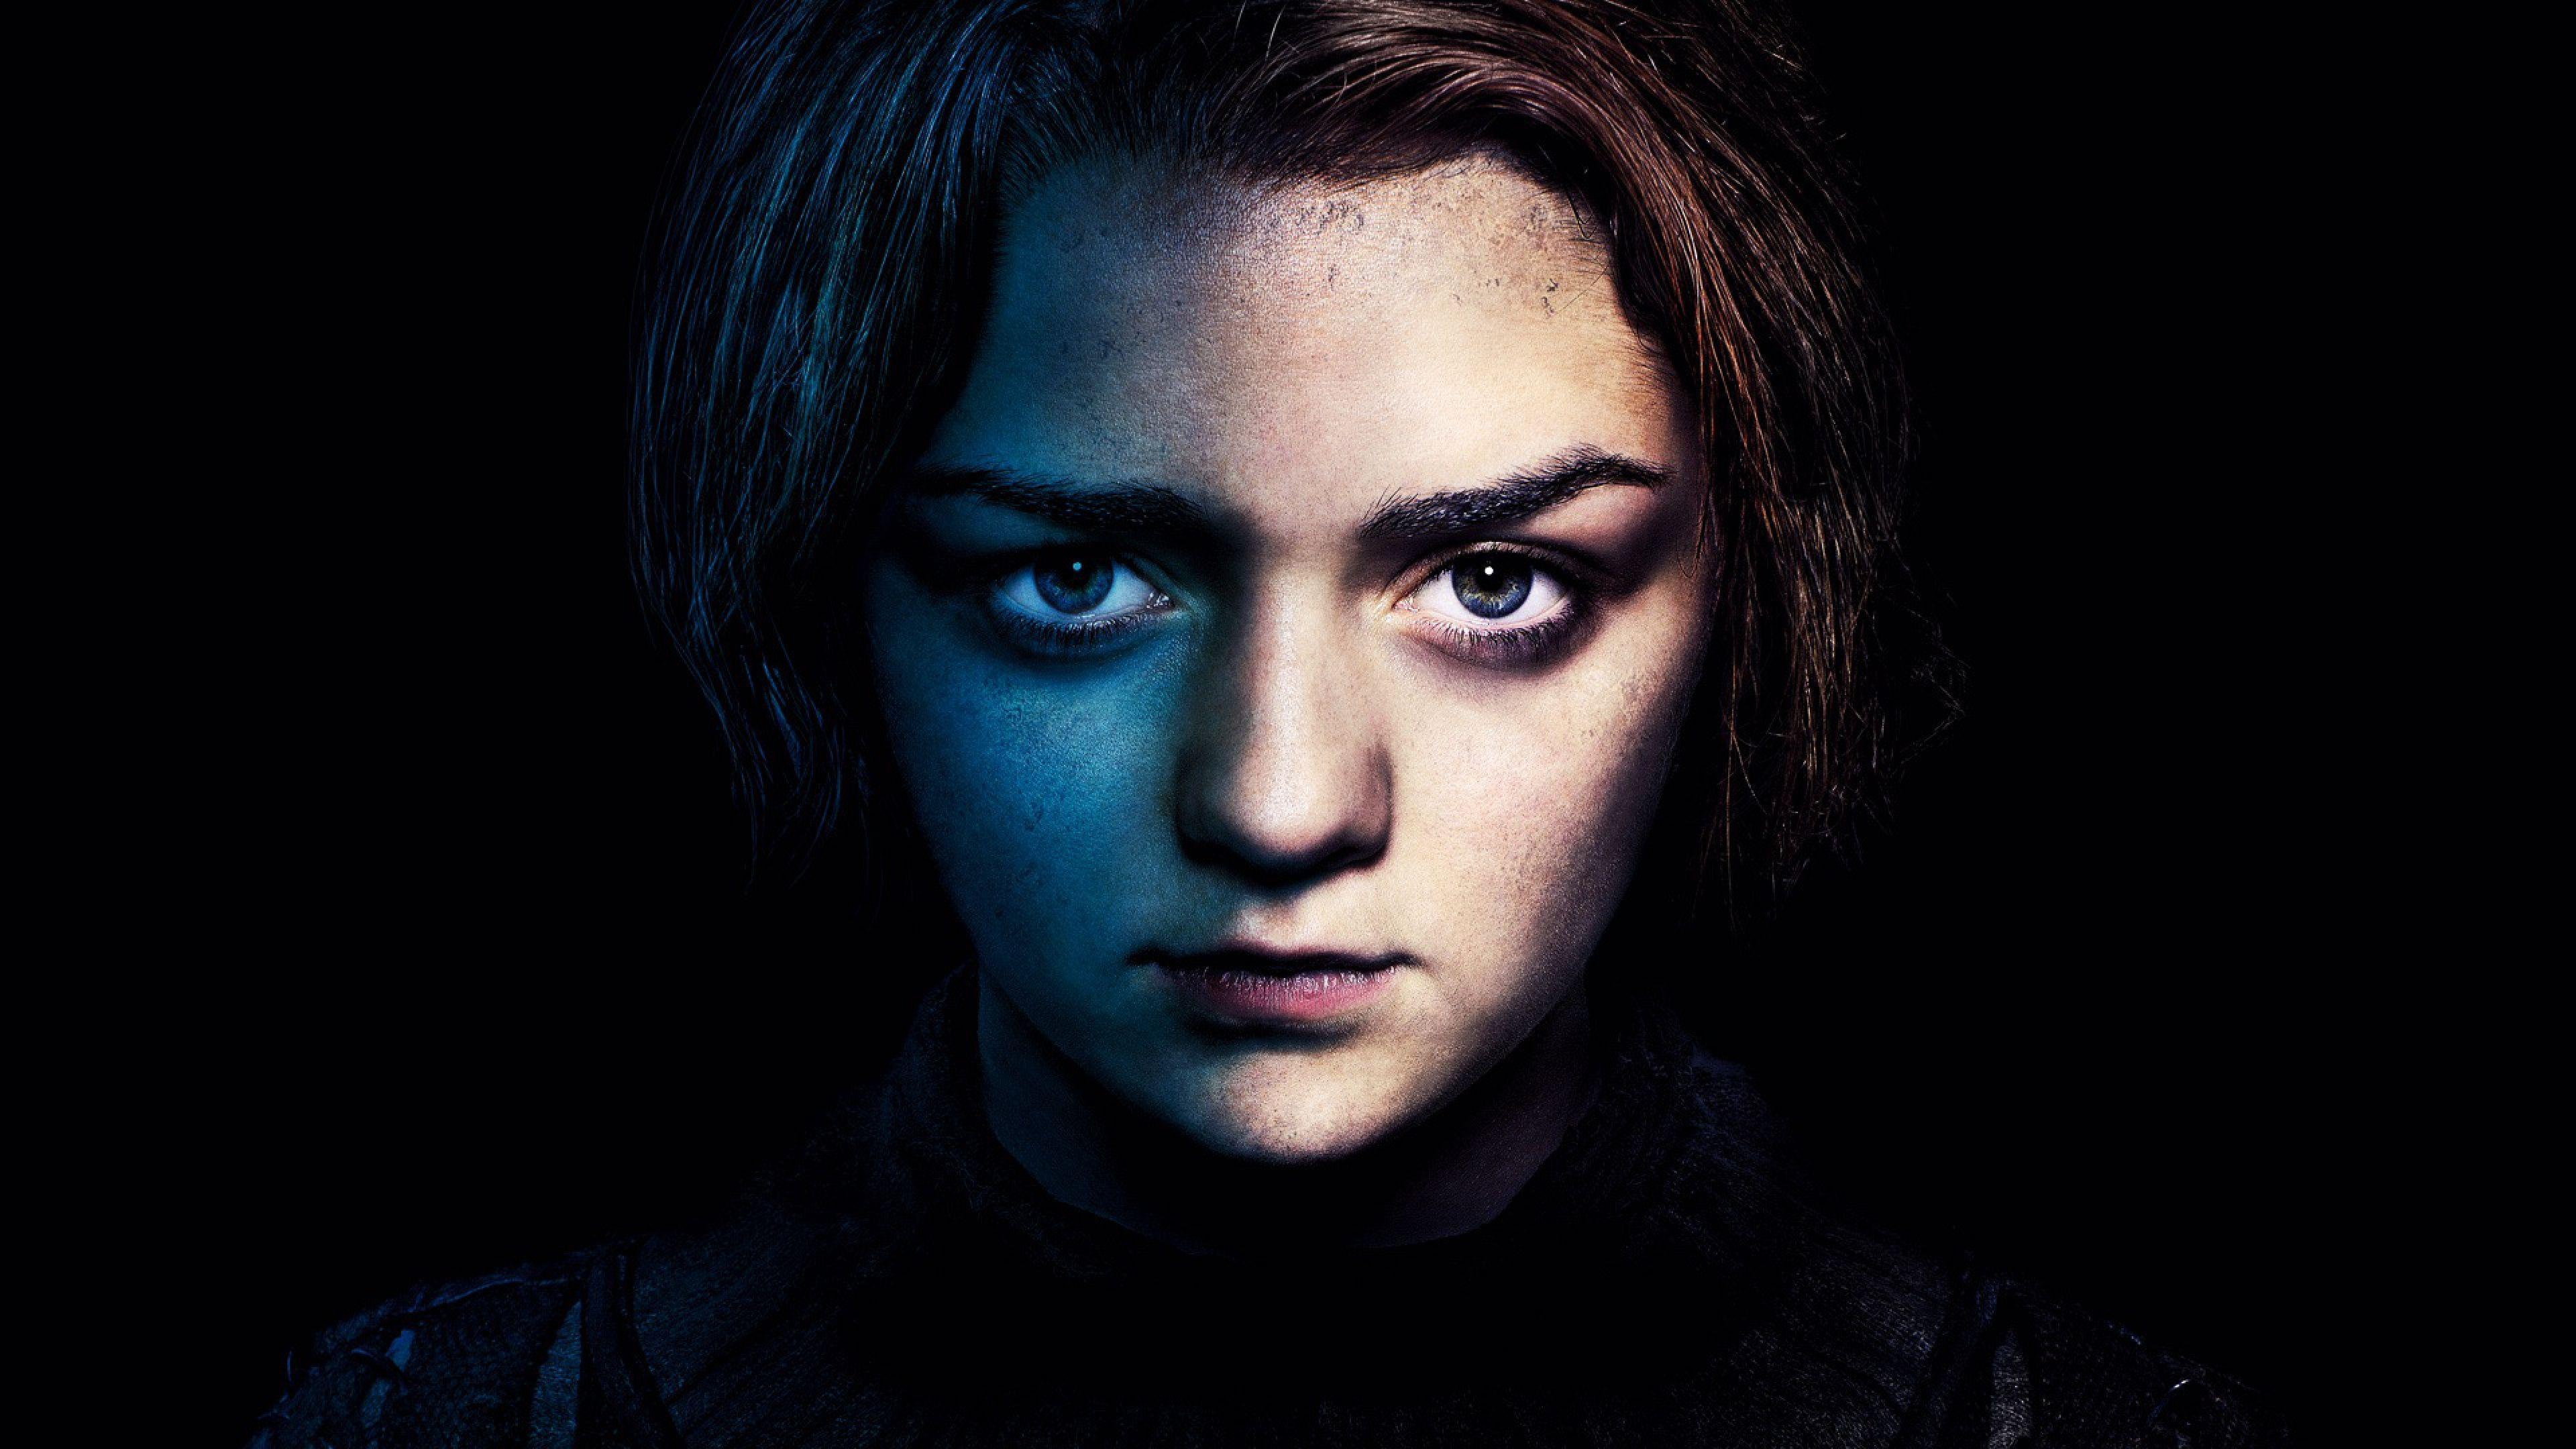 Games Of Thrones Season 8 Quotes - HD Wallpaper